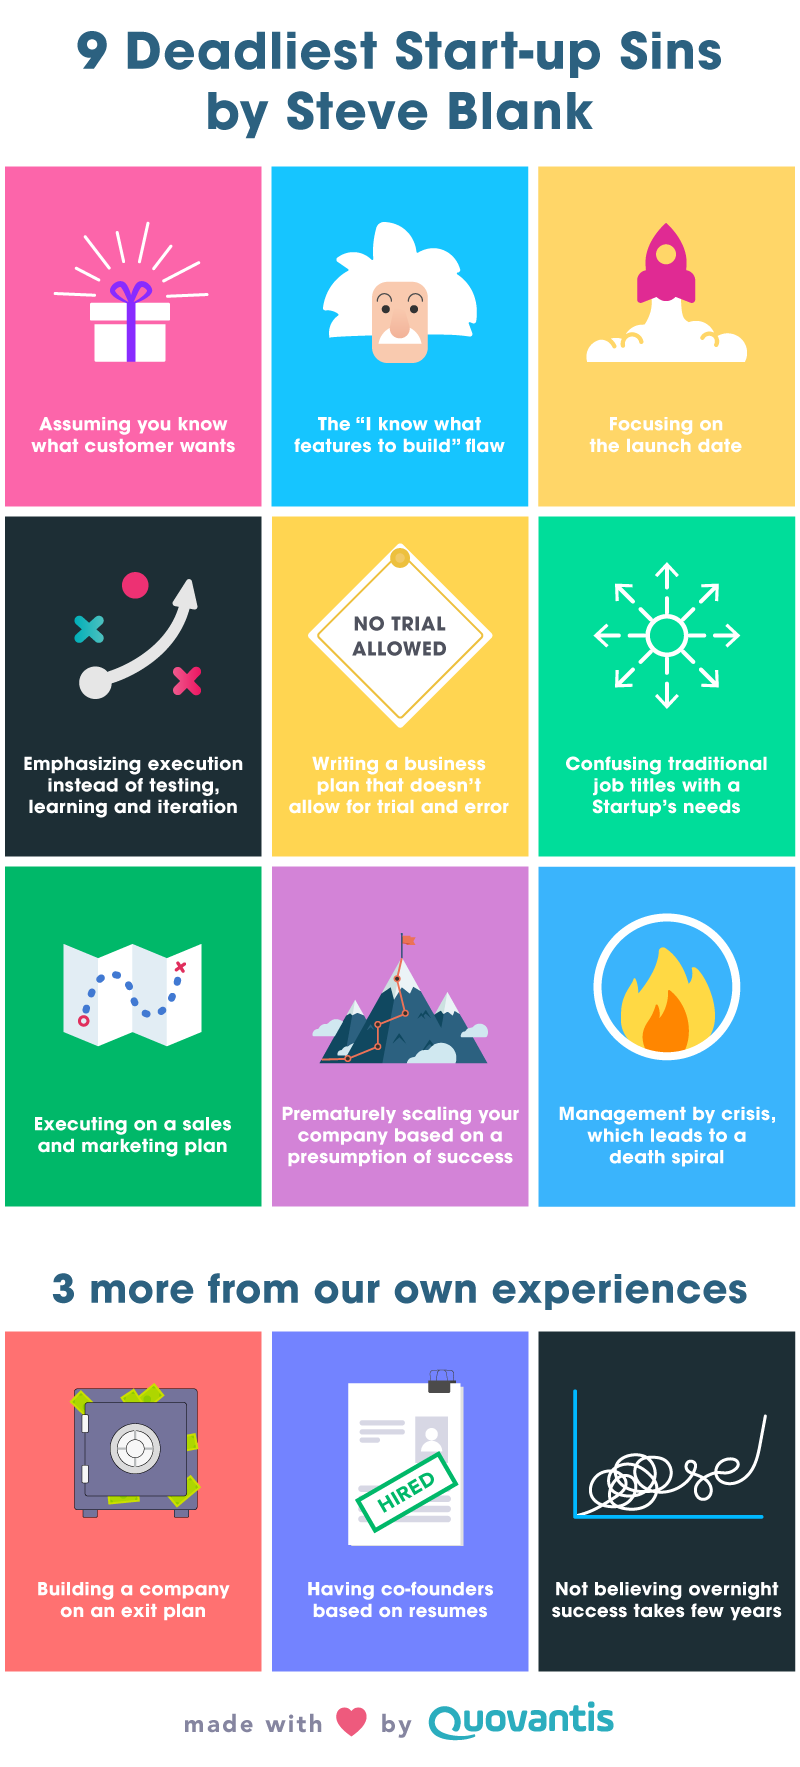 9 Startup sins by Steve Blank